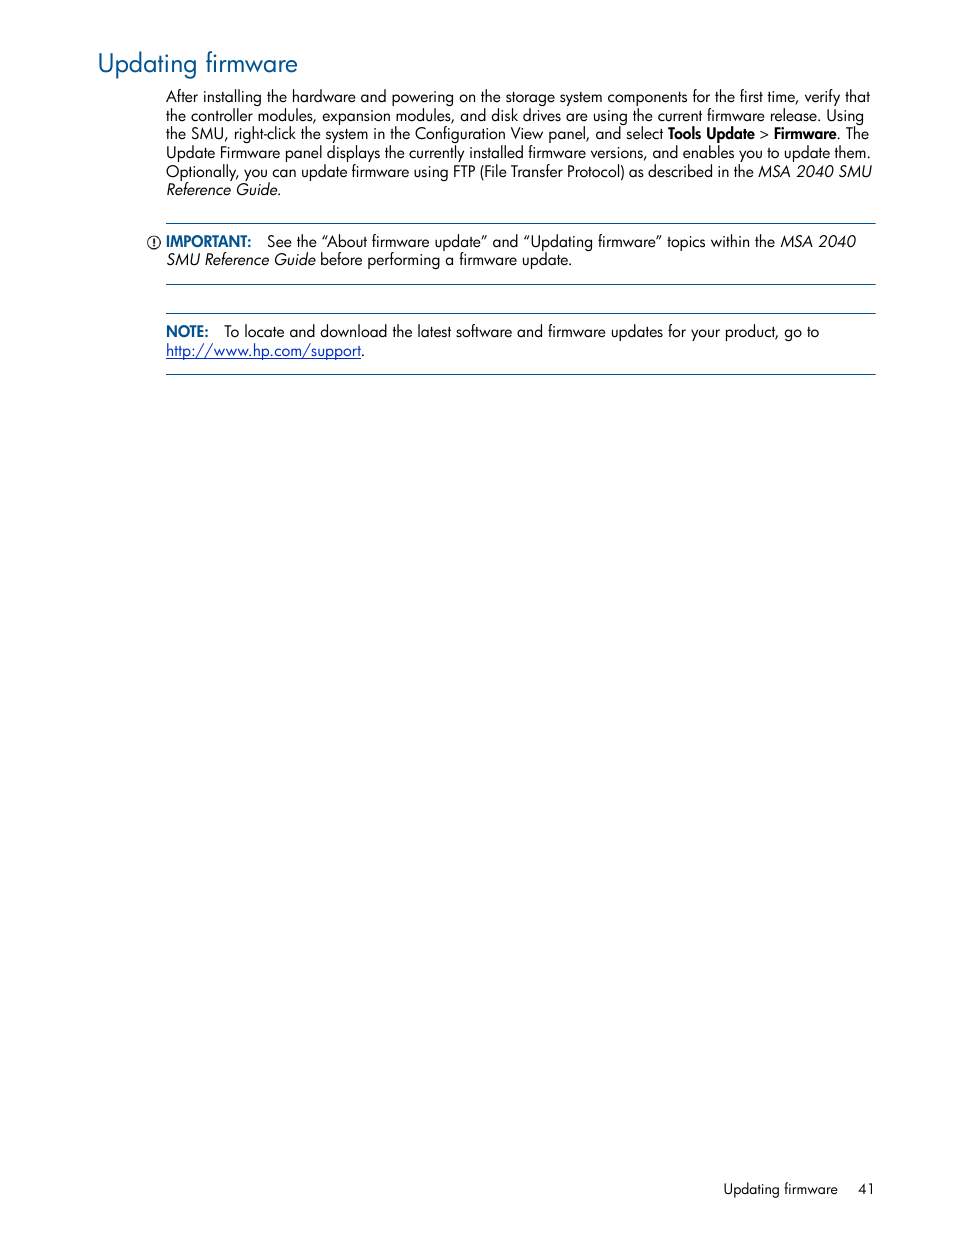 hp msa 2040 firmware bundle download